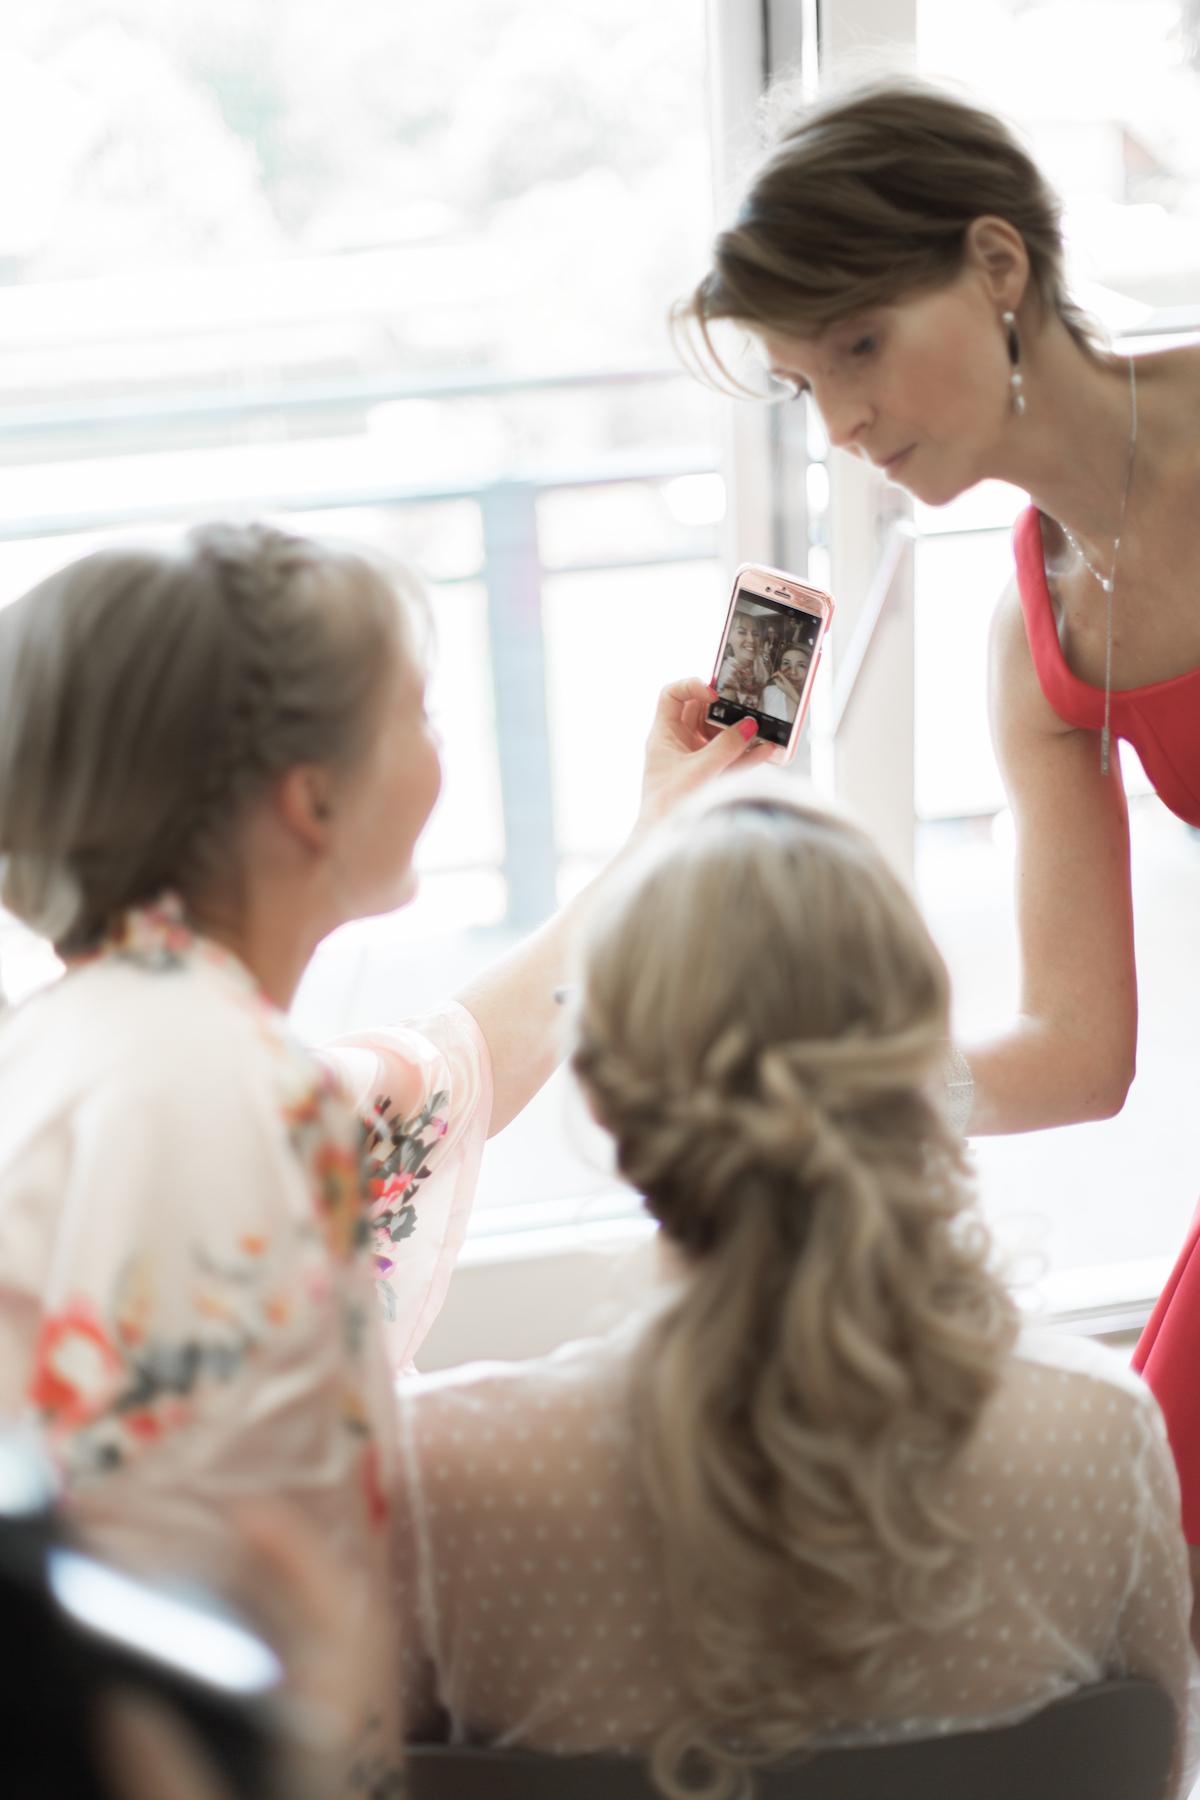 annecy-wedding-photos-23.jpg